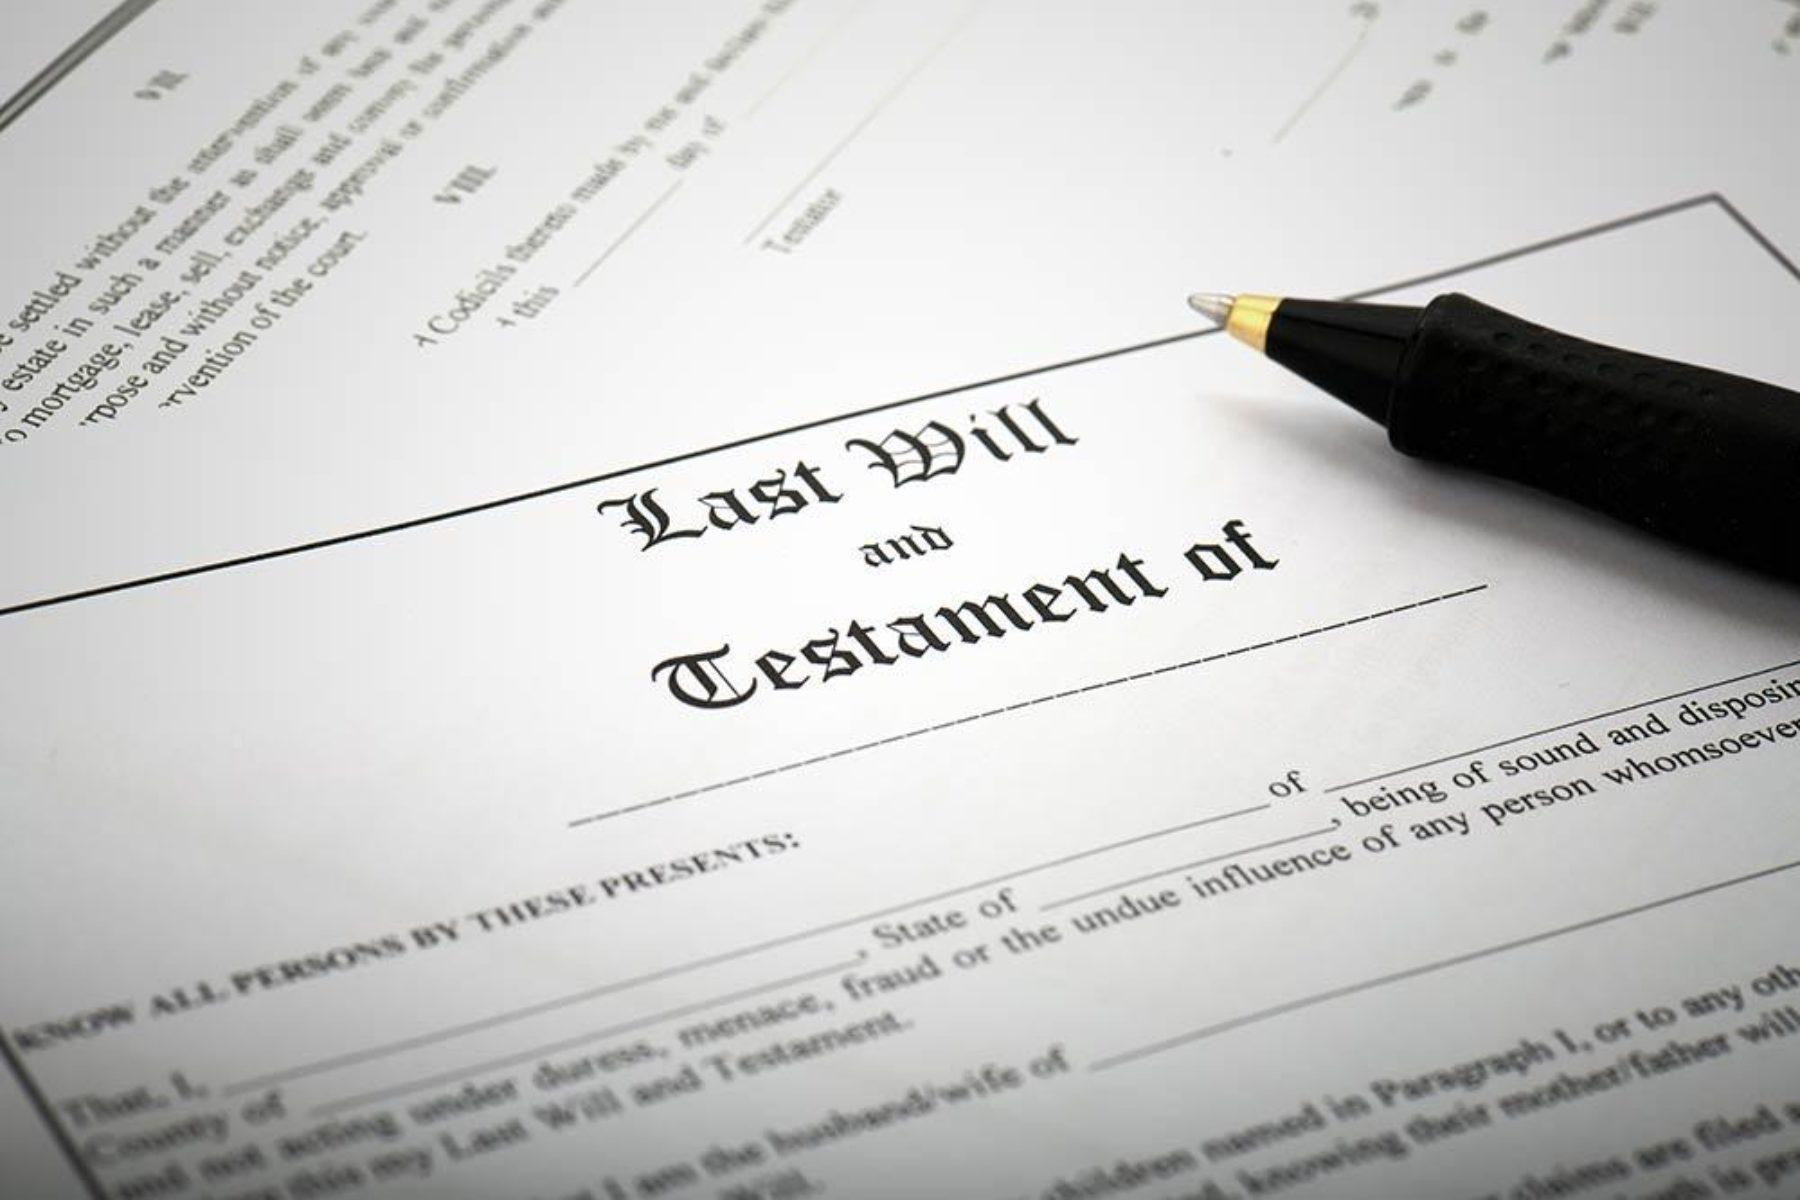 Deceased estate tax returns Adelaide tax planning